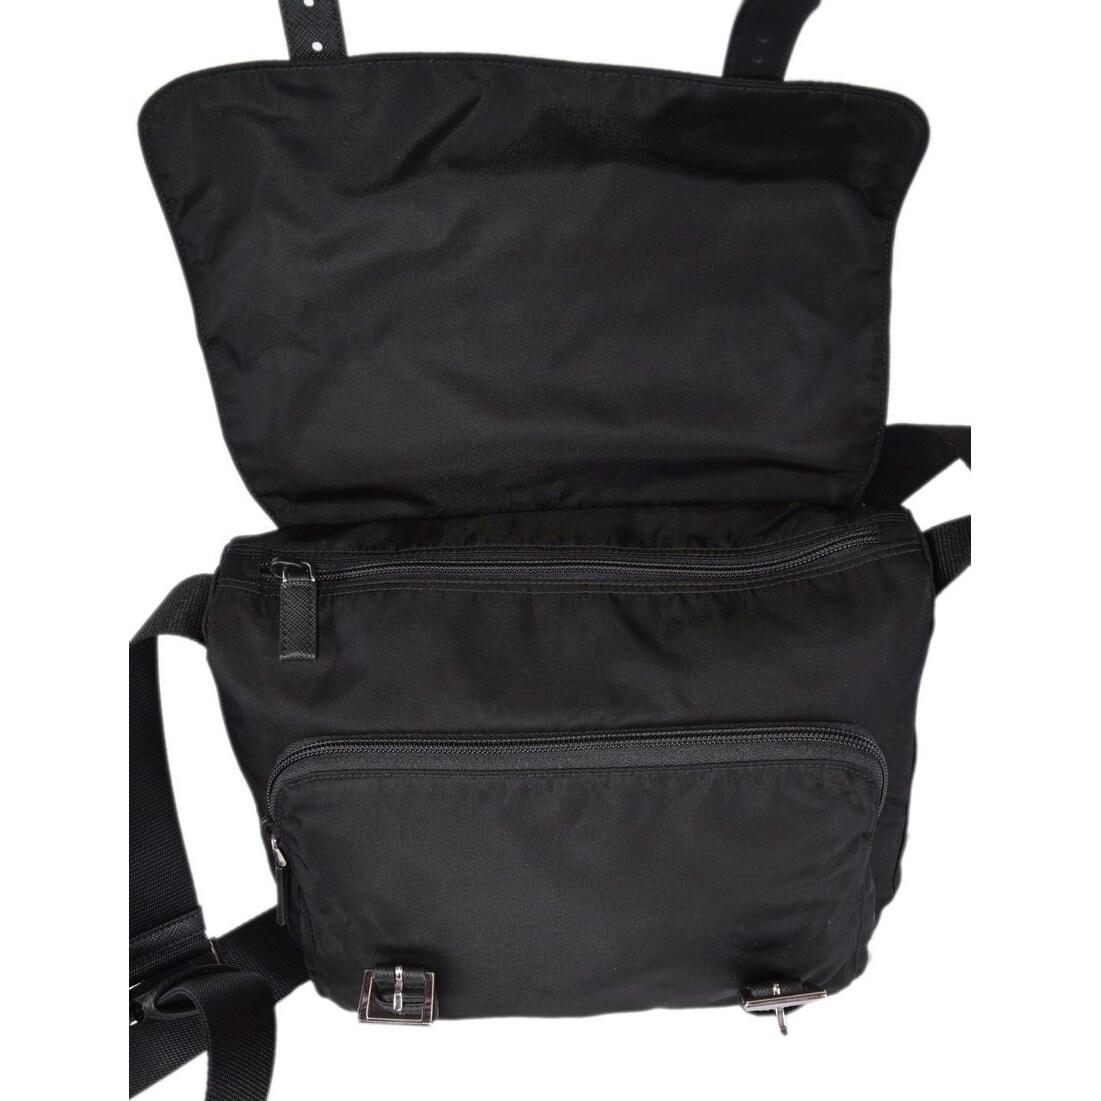 b1754be02cc81f Shop Prada 1BD953 Pattina Black Tessuto Nylon Messenger Bag Crossbody Purse  - Free Shipping Today - Overstock - 26440735